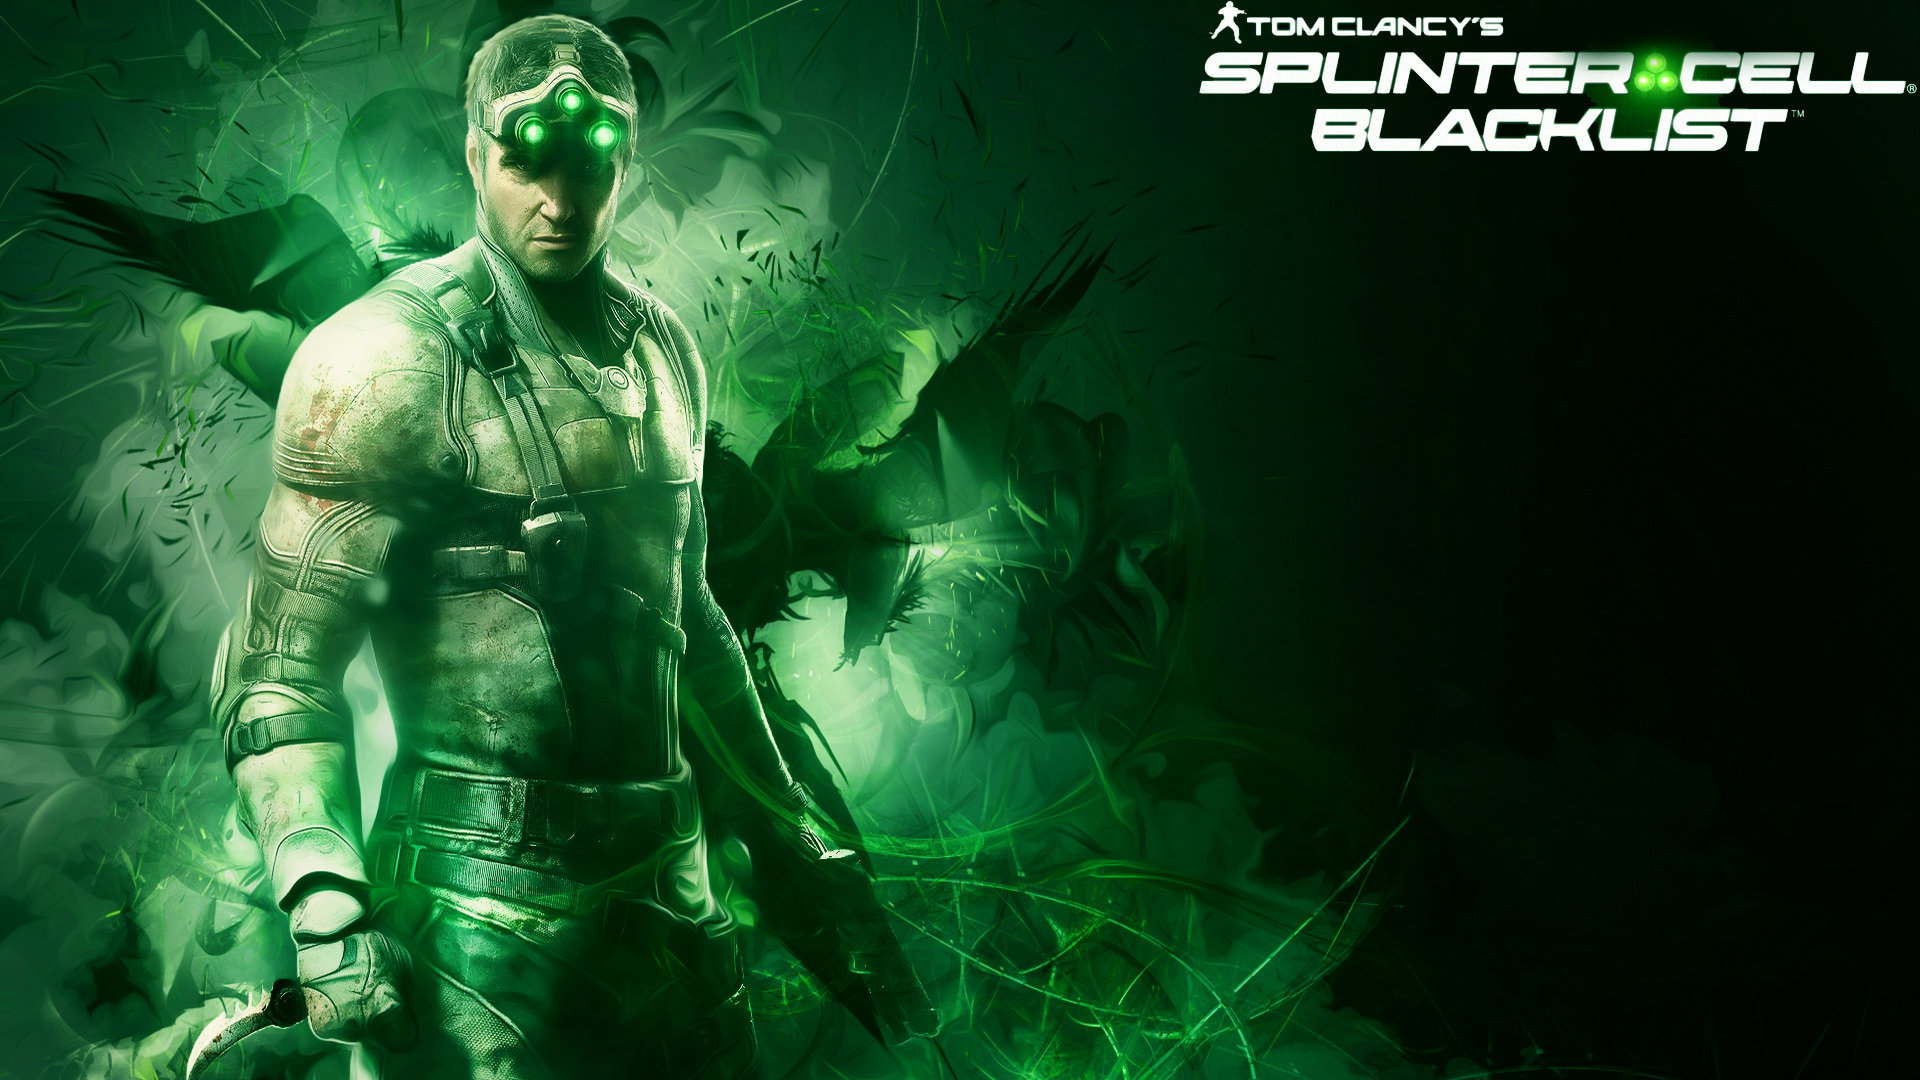 Splinter Cell Blacklist Wallpaper Download 1920x1080